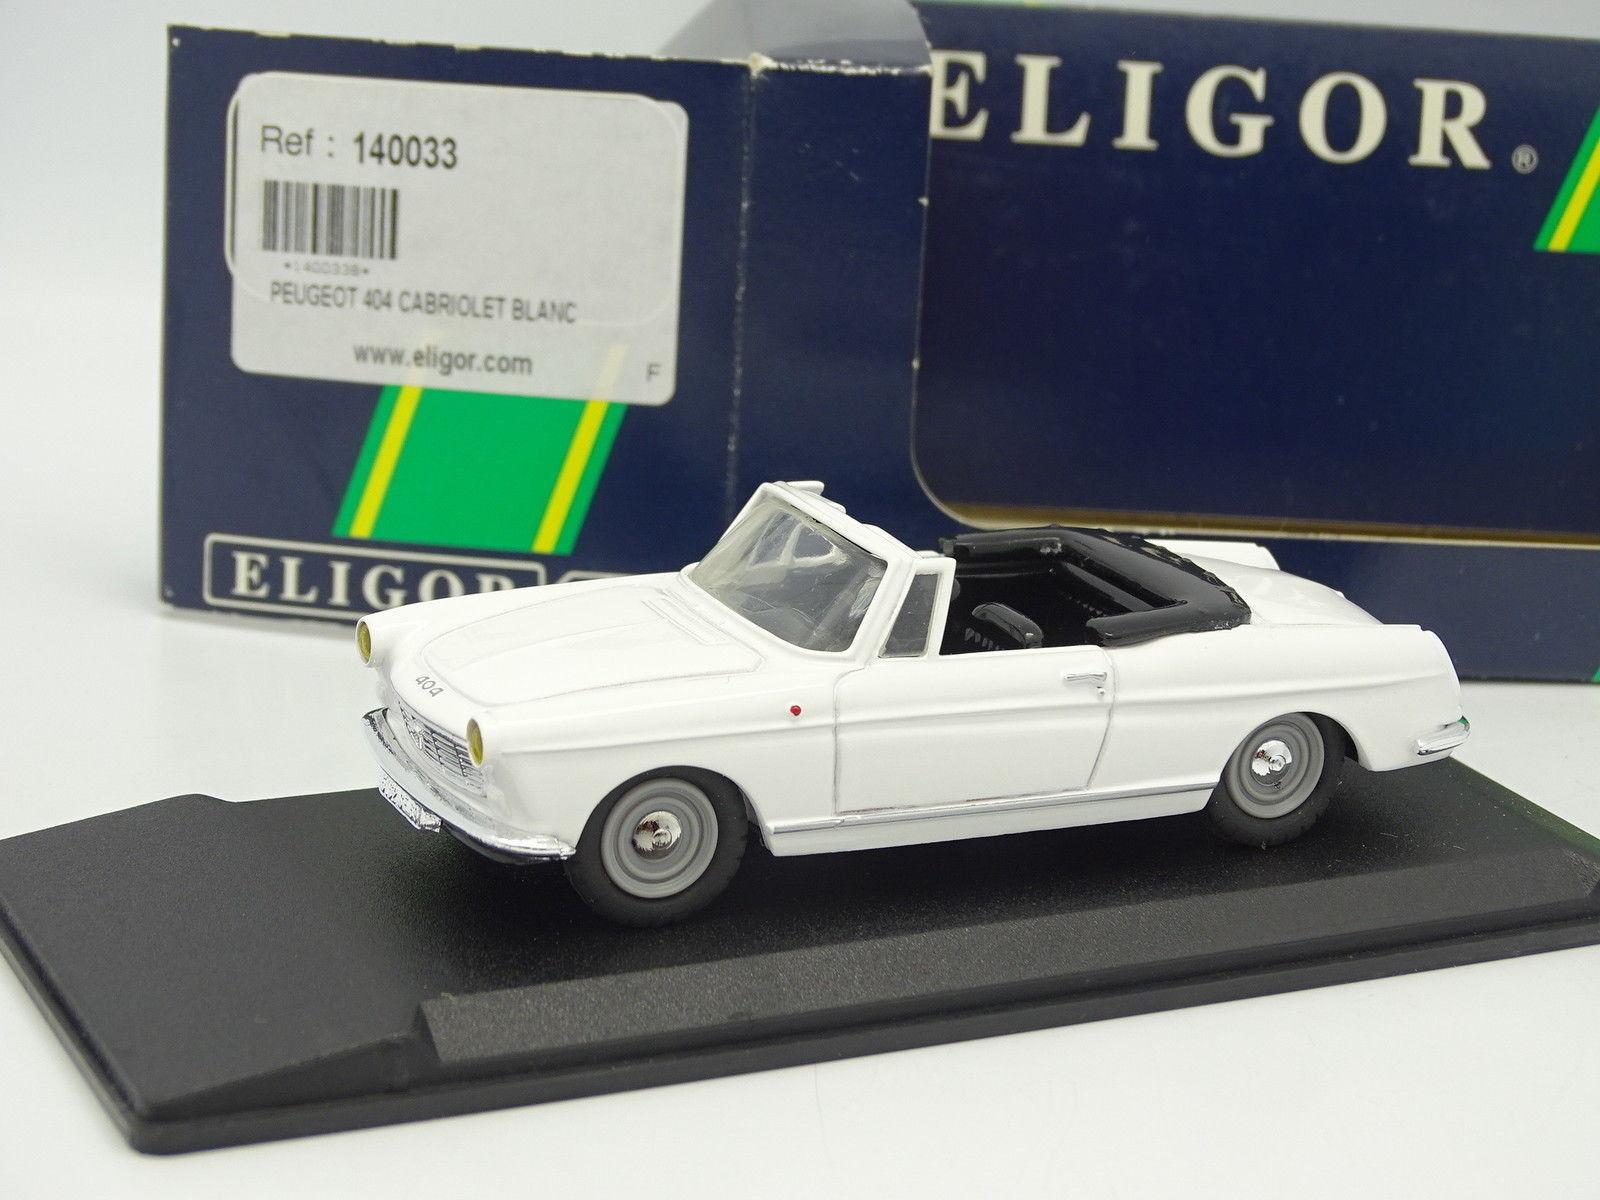 Leader Résine 1 43 - Peugeot 404 Cabriolet Blanche